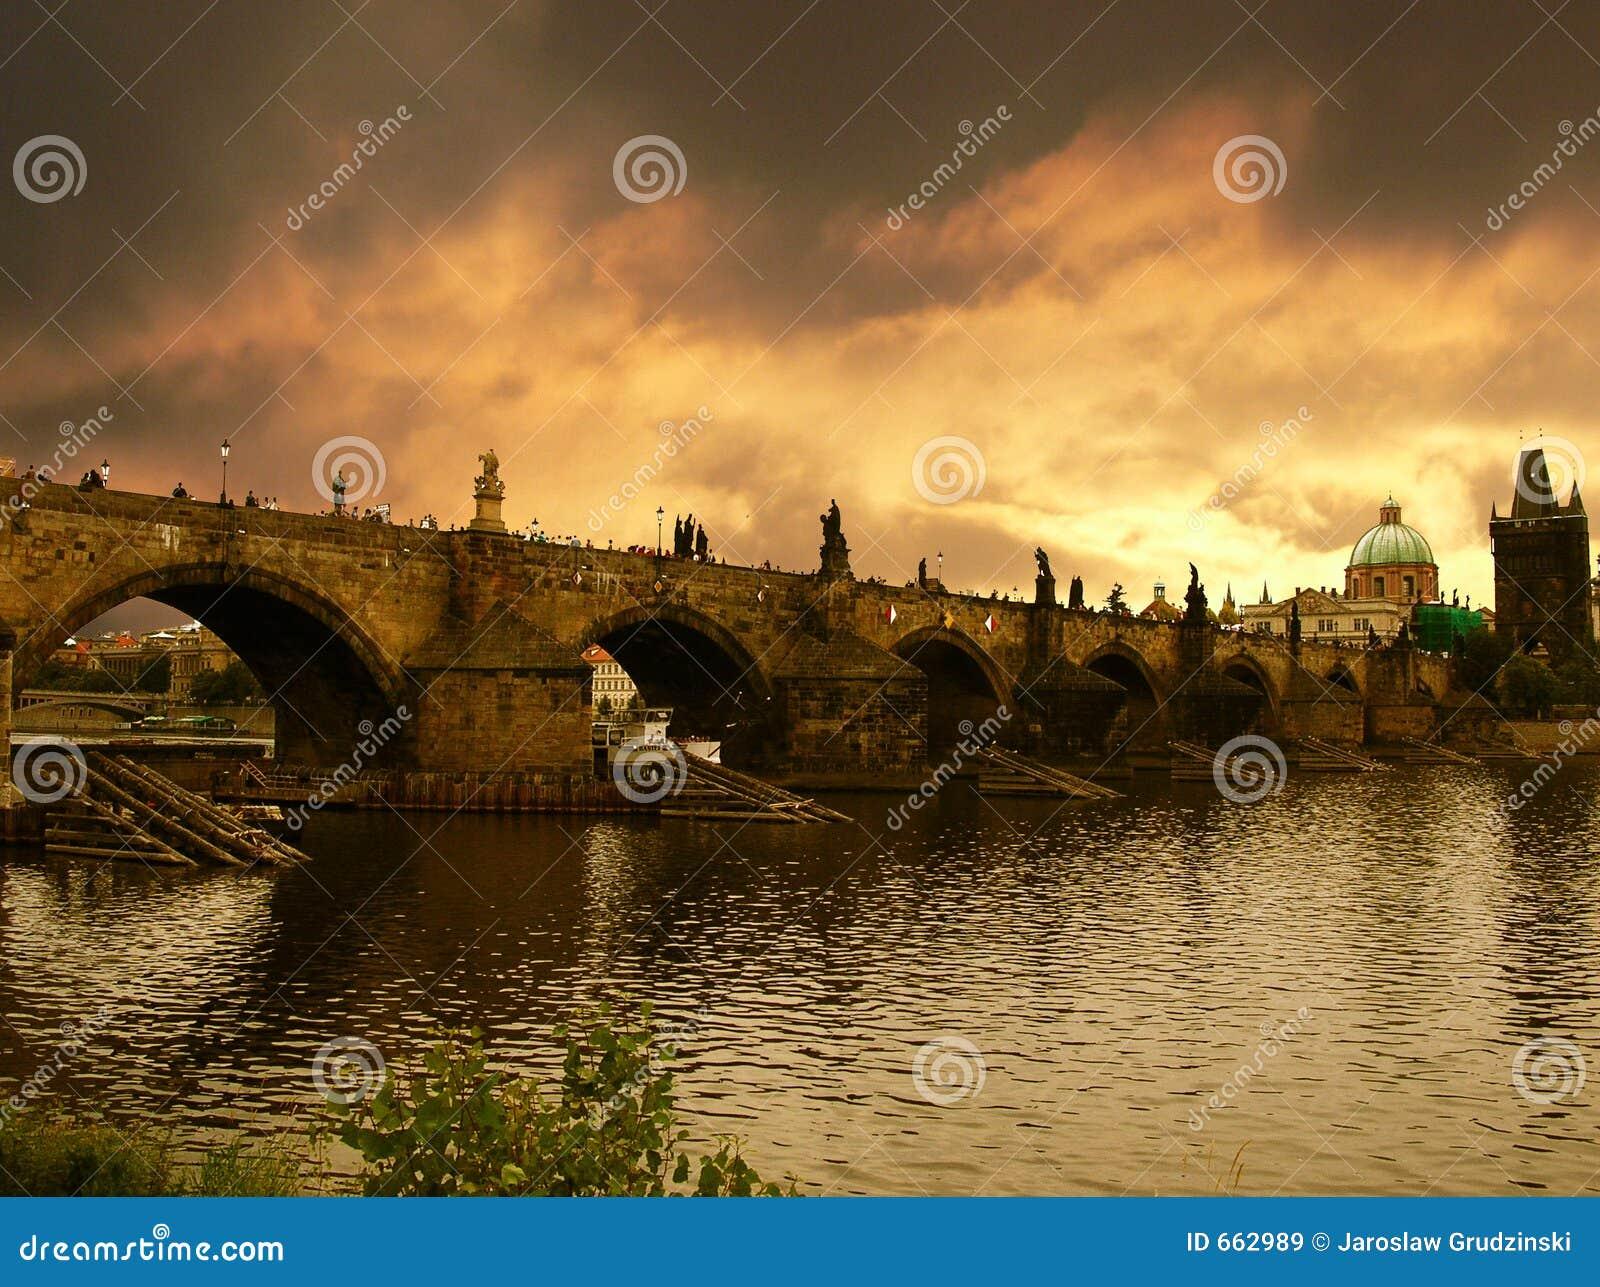 Sunset over Charles Bridge in Prague